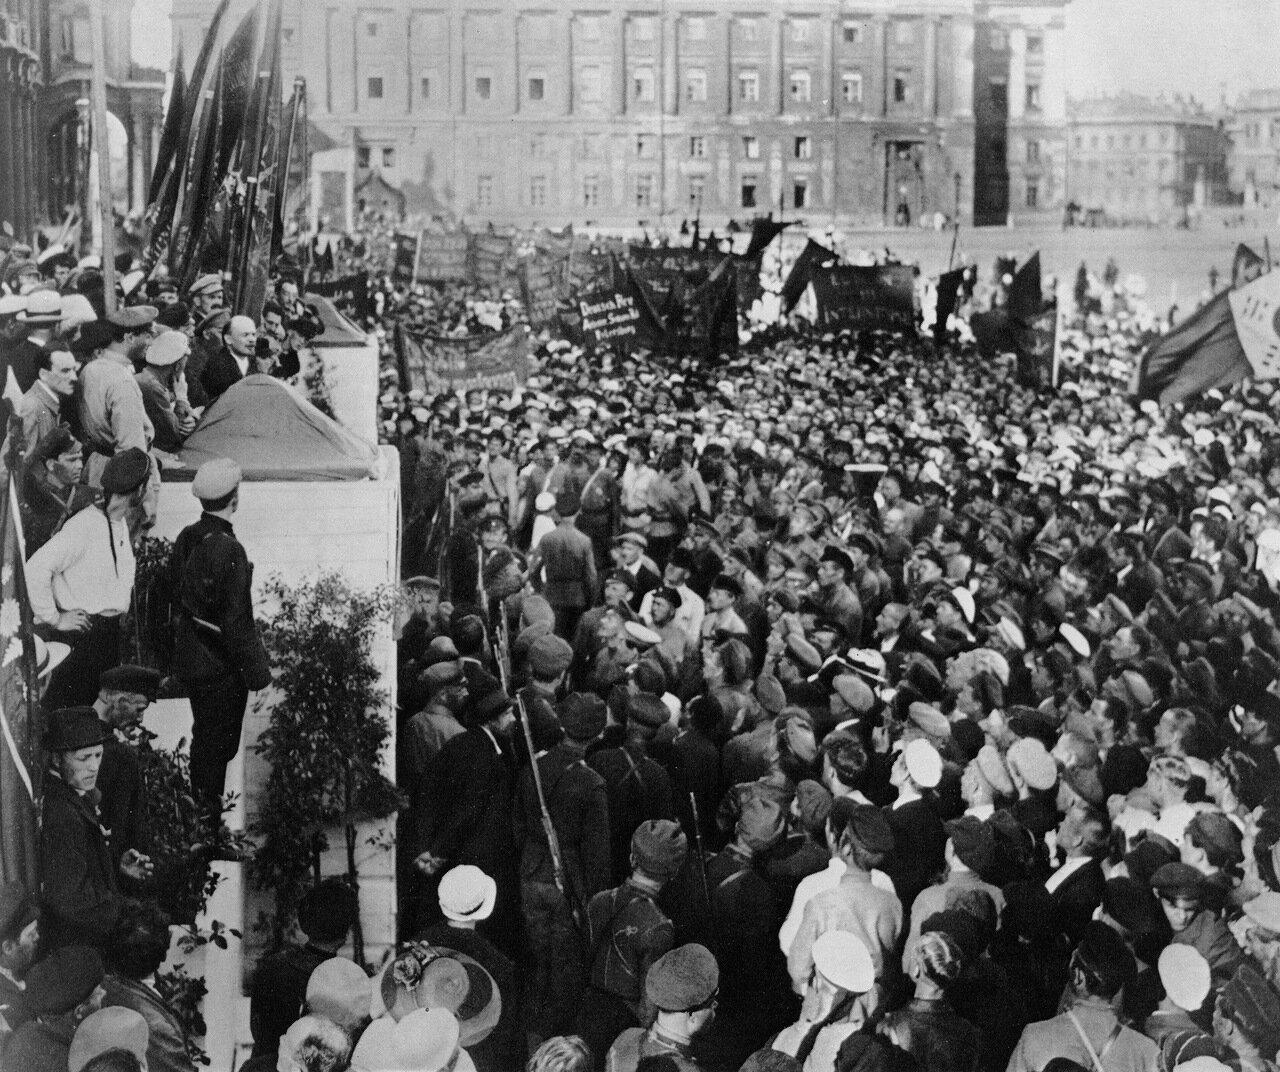 1920. Ленин произносит речь на митинге. Петроград.